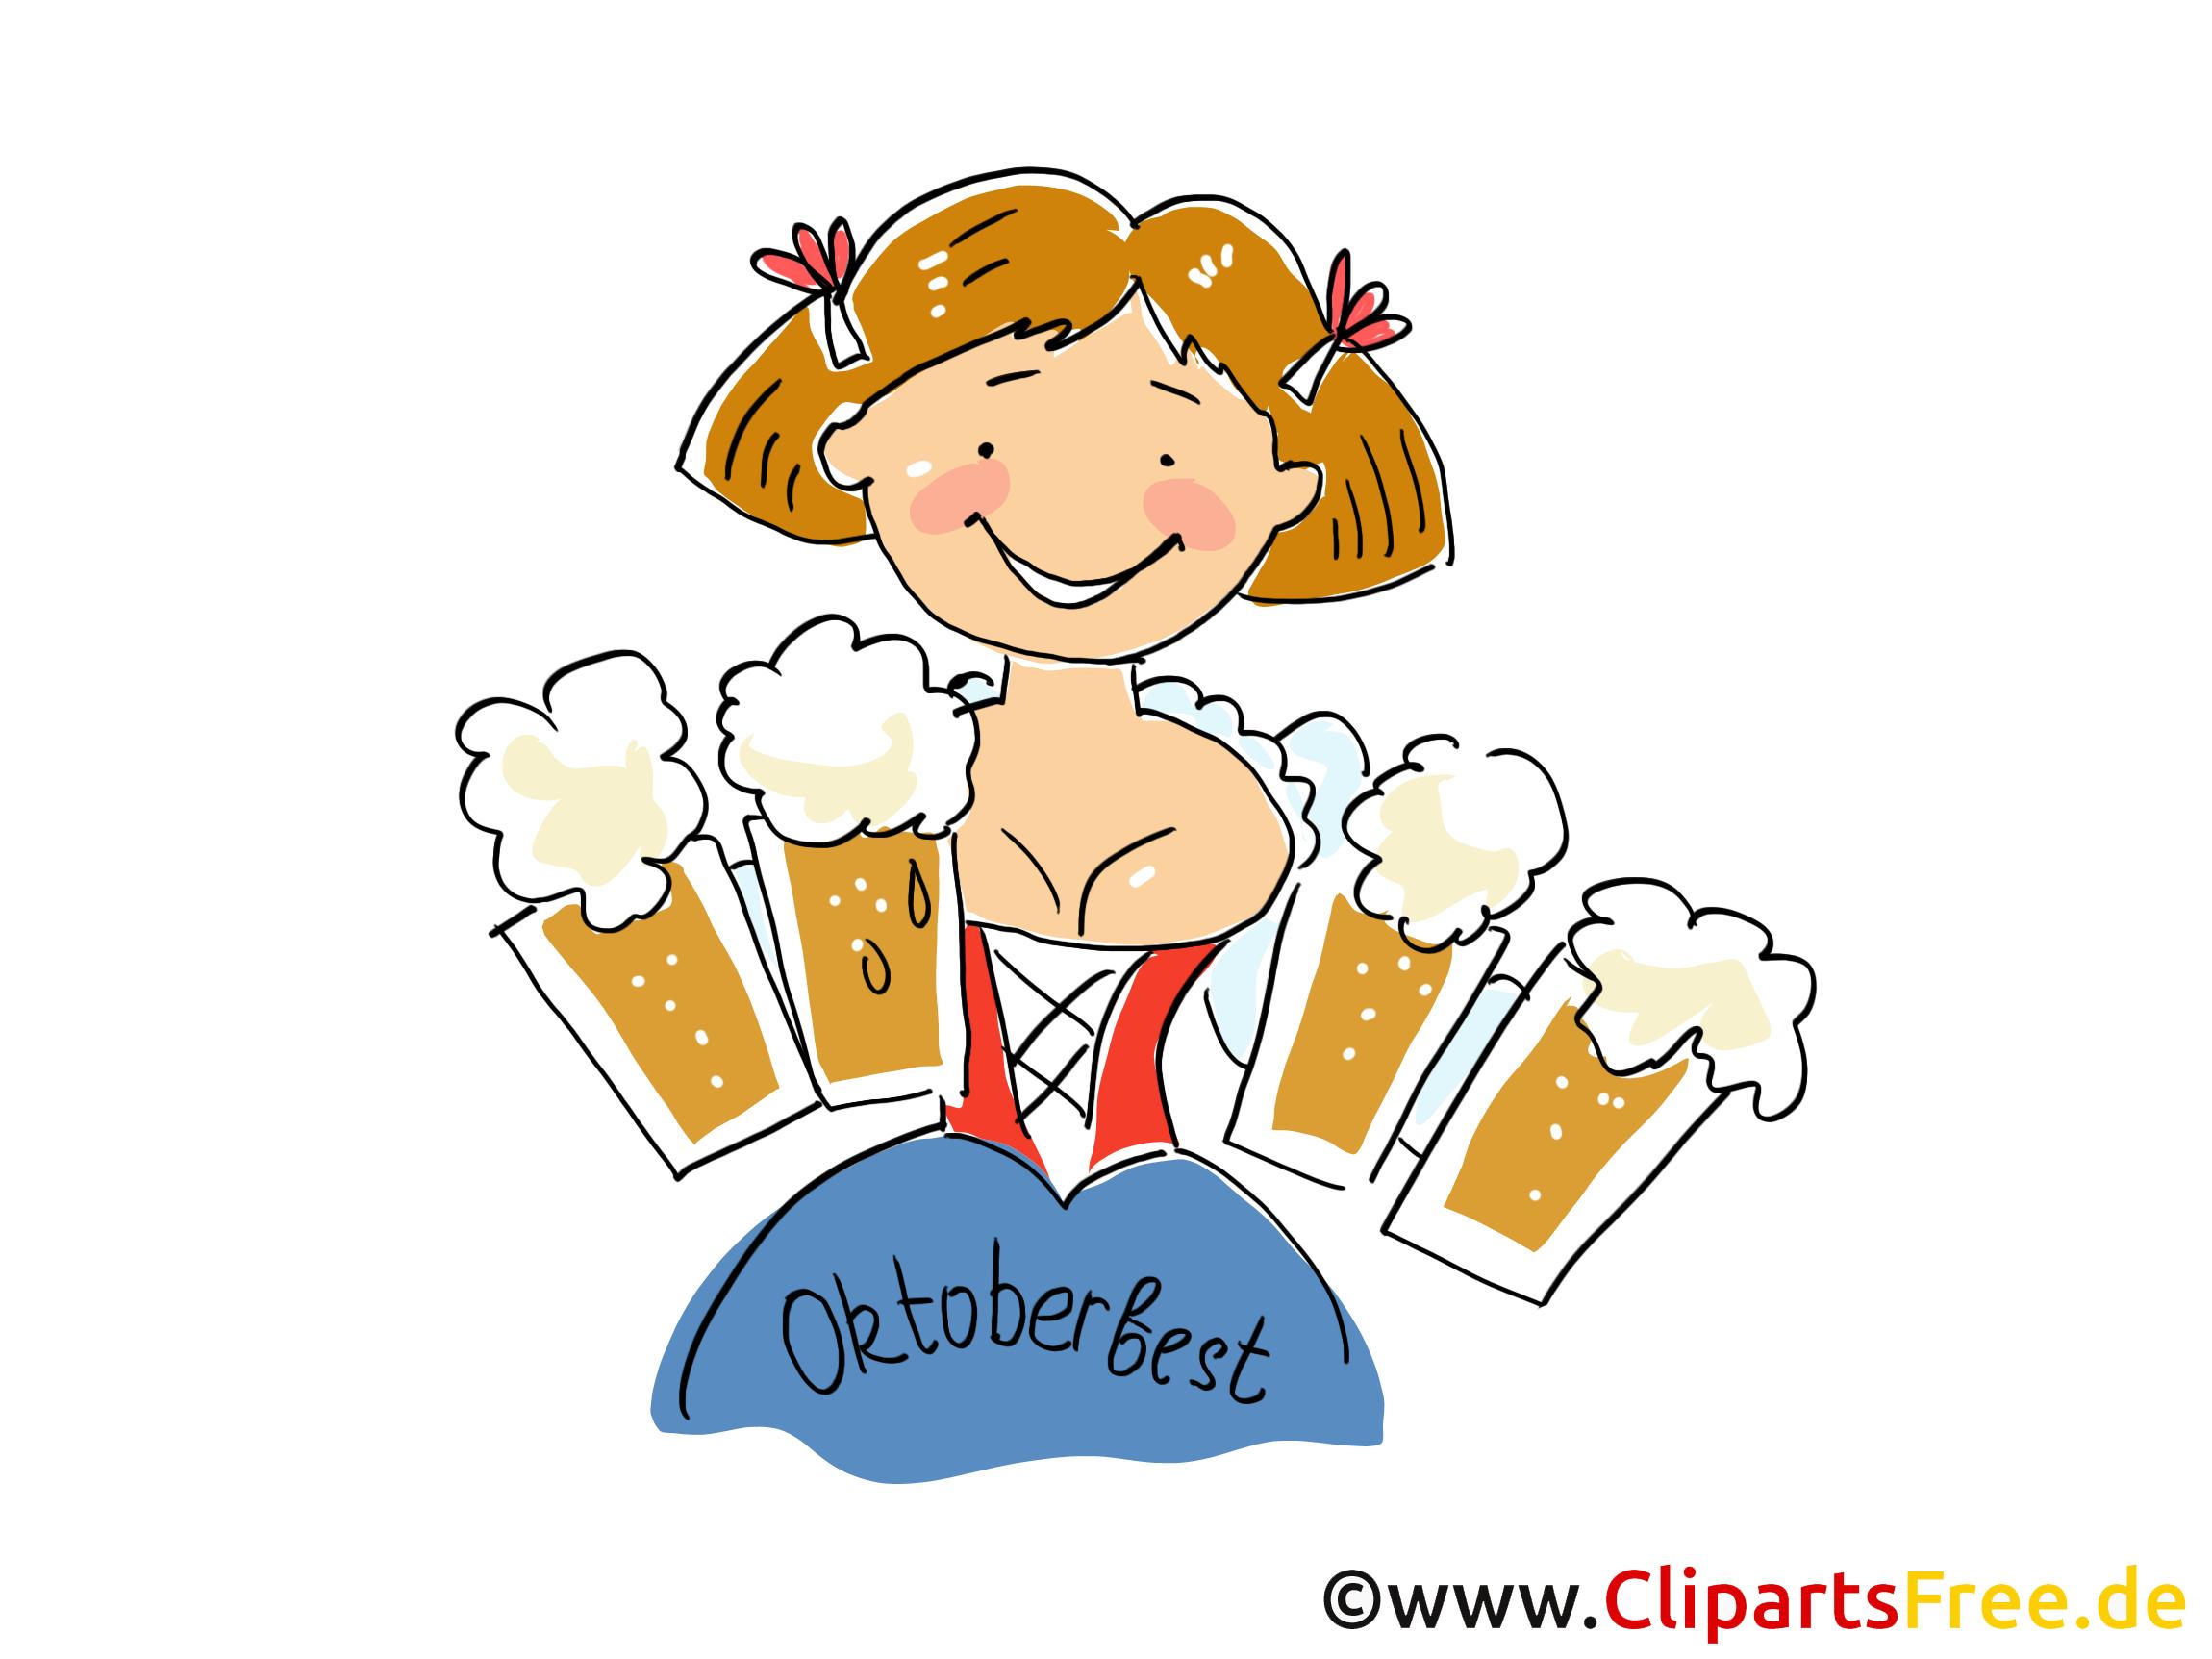 Büro frau clipart kostenlos  Schöne Oktoberfest Frau mit Bier Clipart, Bild, Grafik ...